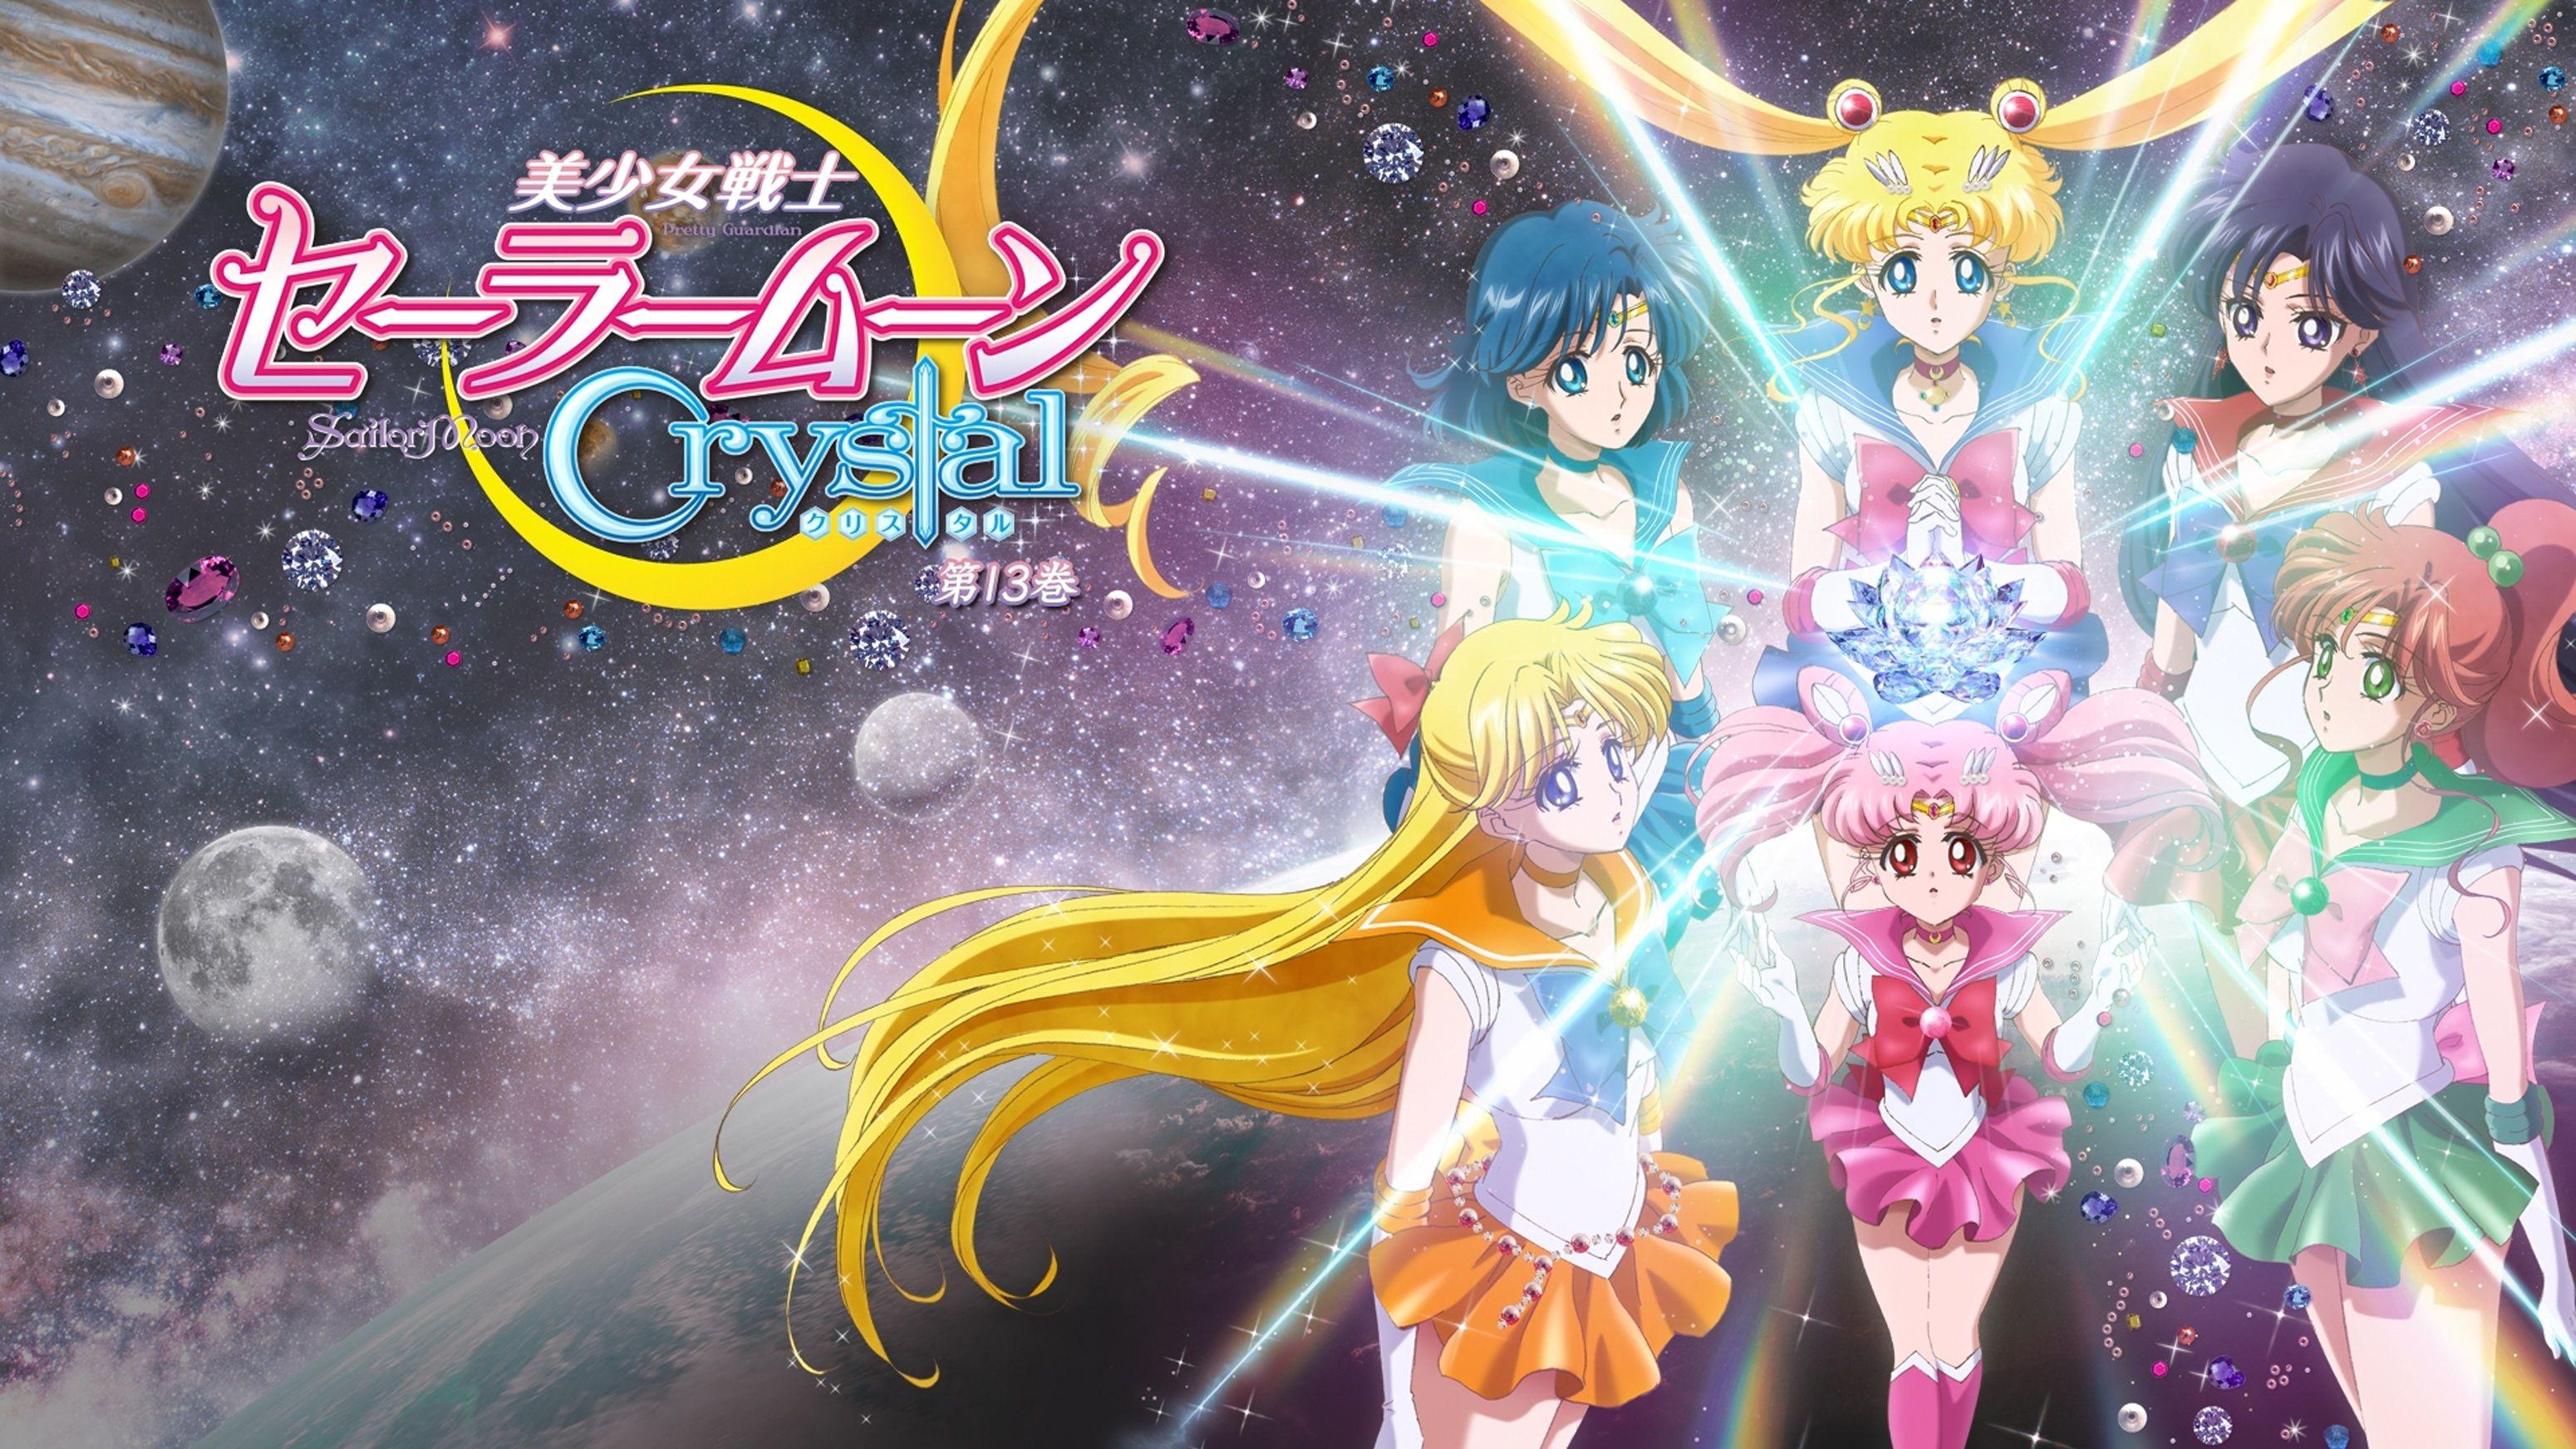 Wallpaper HD Sailor Moon Crystal DVD 13 Gekkan shoujo